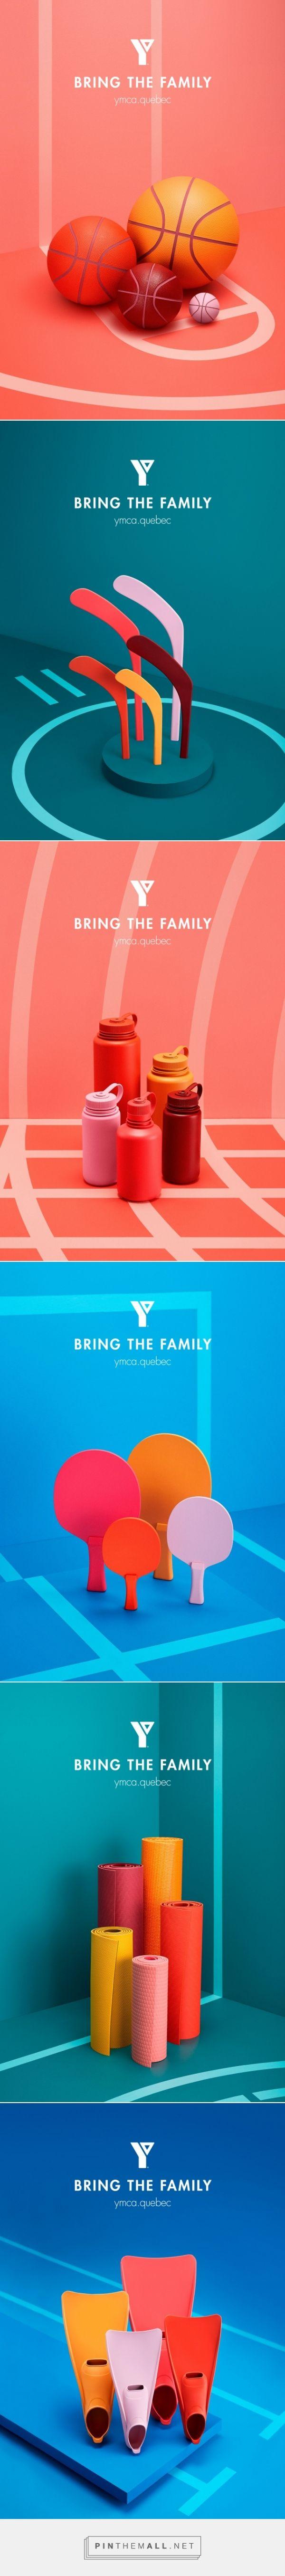 YMCA: Bring The Family - Adeevee